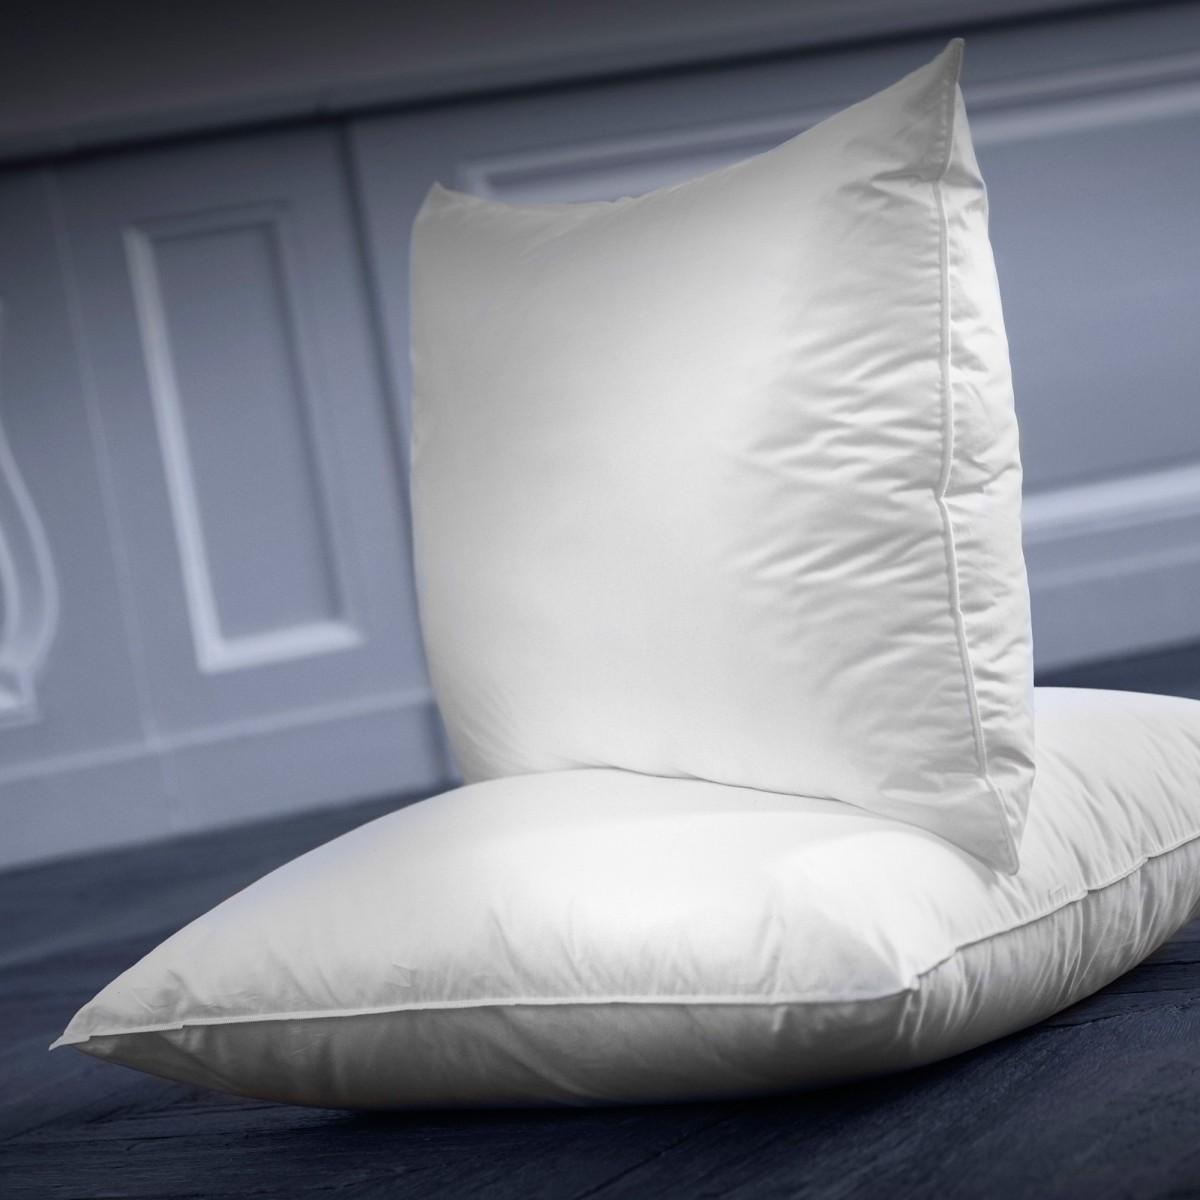 oreiller dumas Synthetic soft comfort pillow Arpège   Dumas Paris oreiller dumas